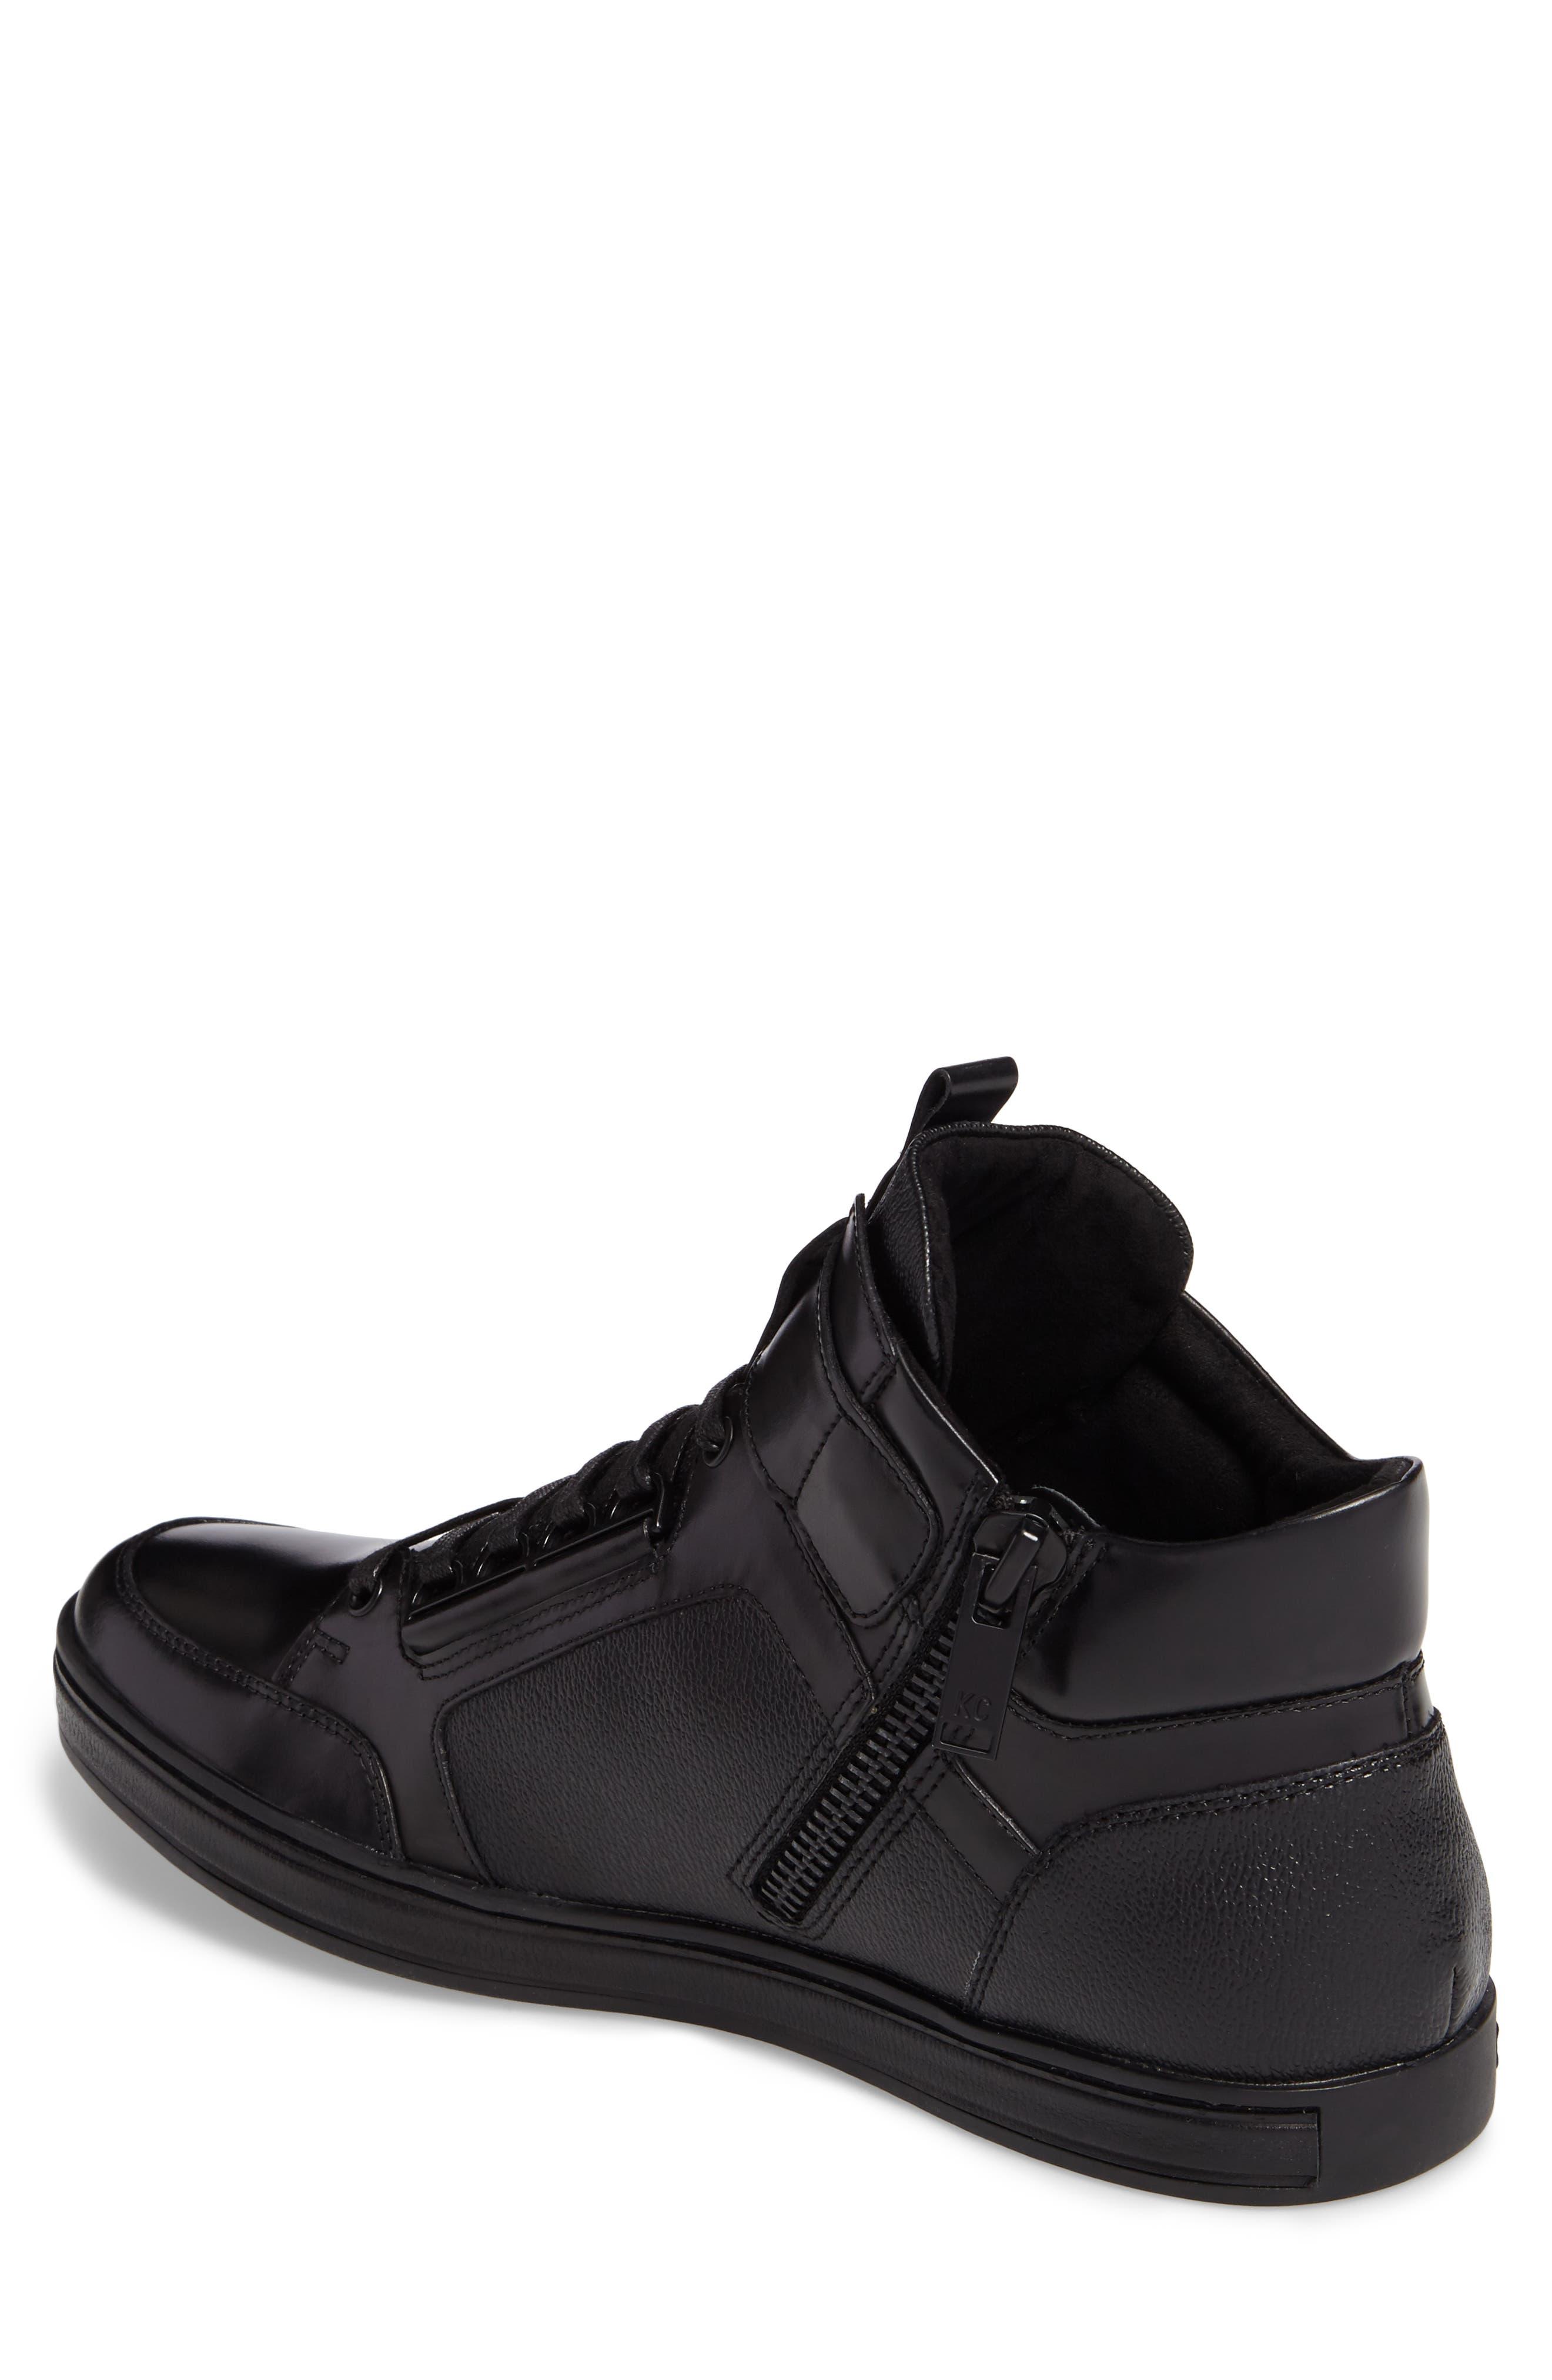 Brand-Y Sneaker,                             Alternate thumbnail 2, color,                             001